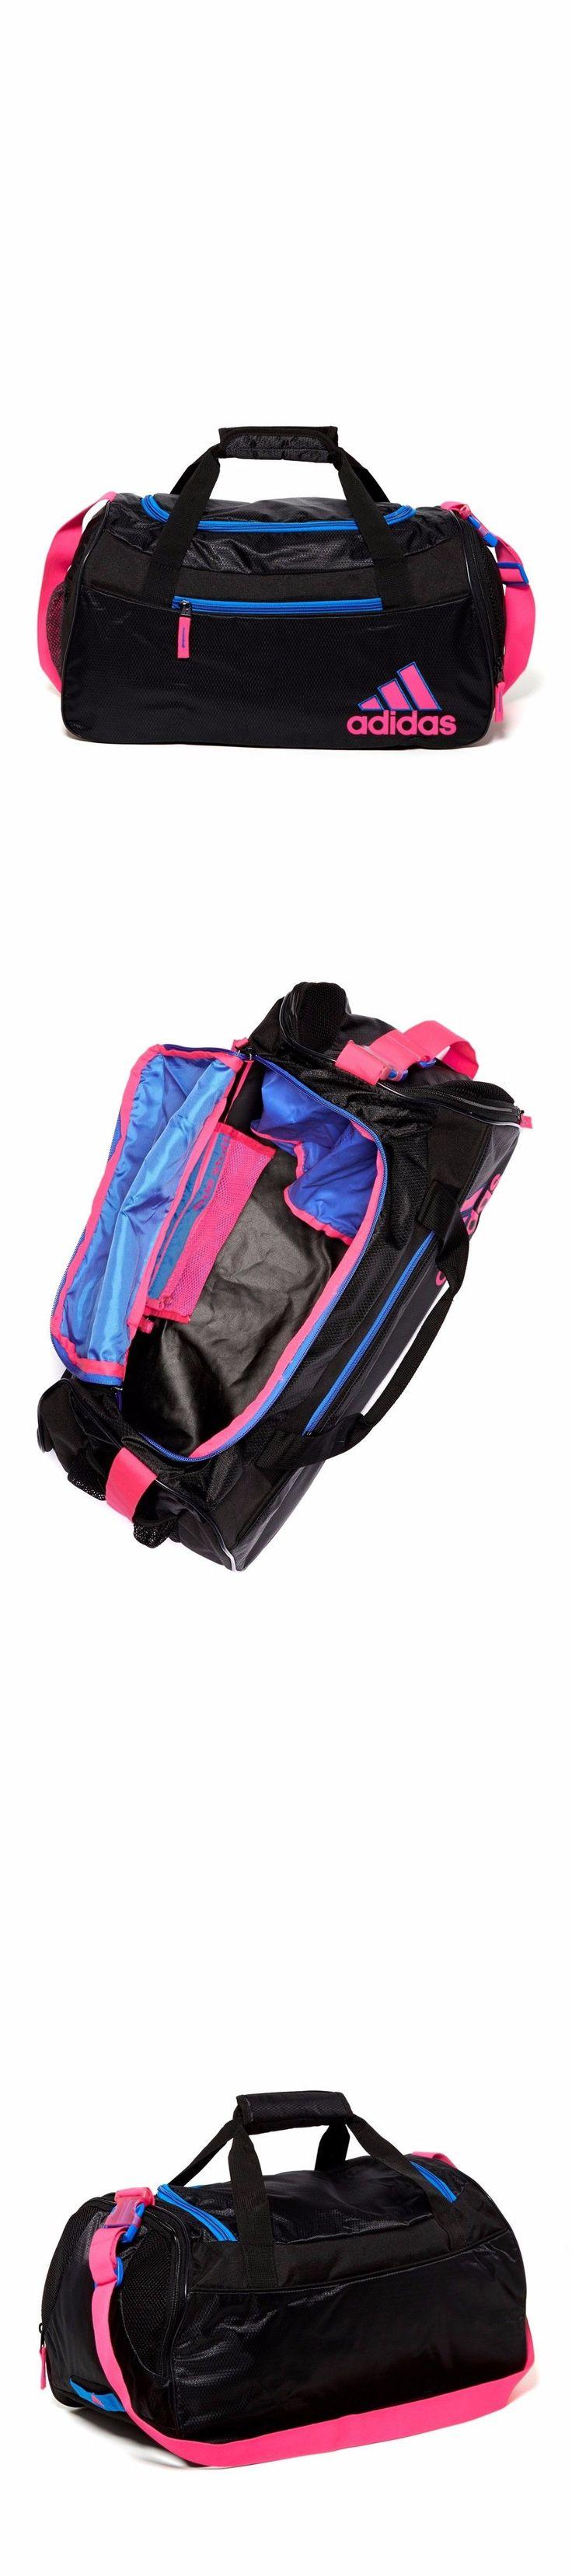 Gym Bags 68816: Adidas Squad Ii Duffel Women Gym Bag Black/Flash Pink Aqua BUY IT NOW ONLY: $39.95